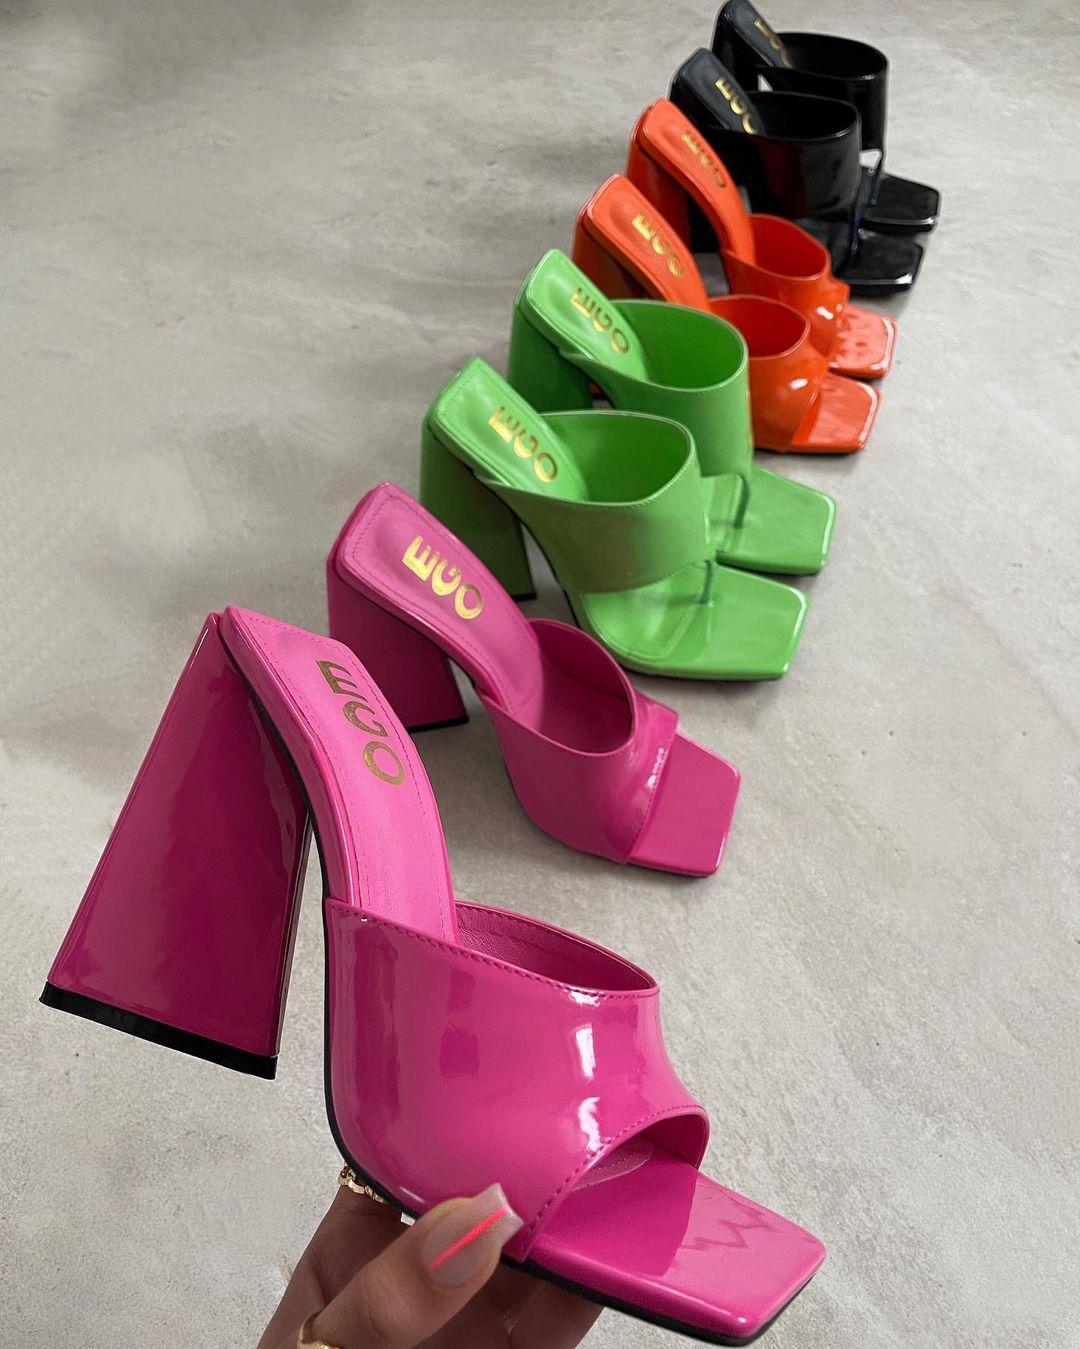 EGO neon green mule heels